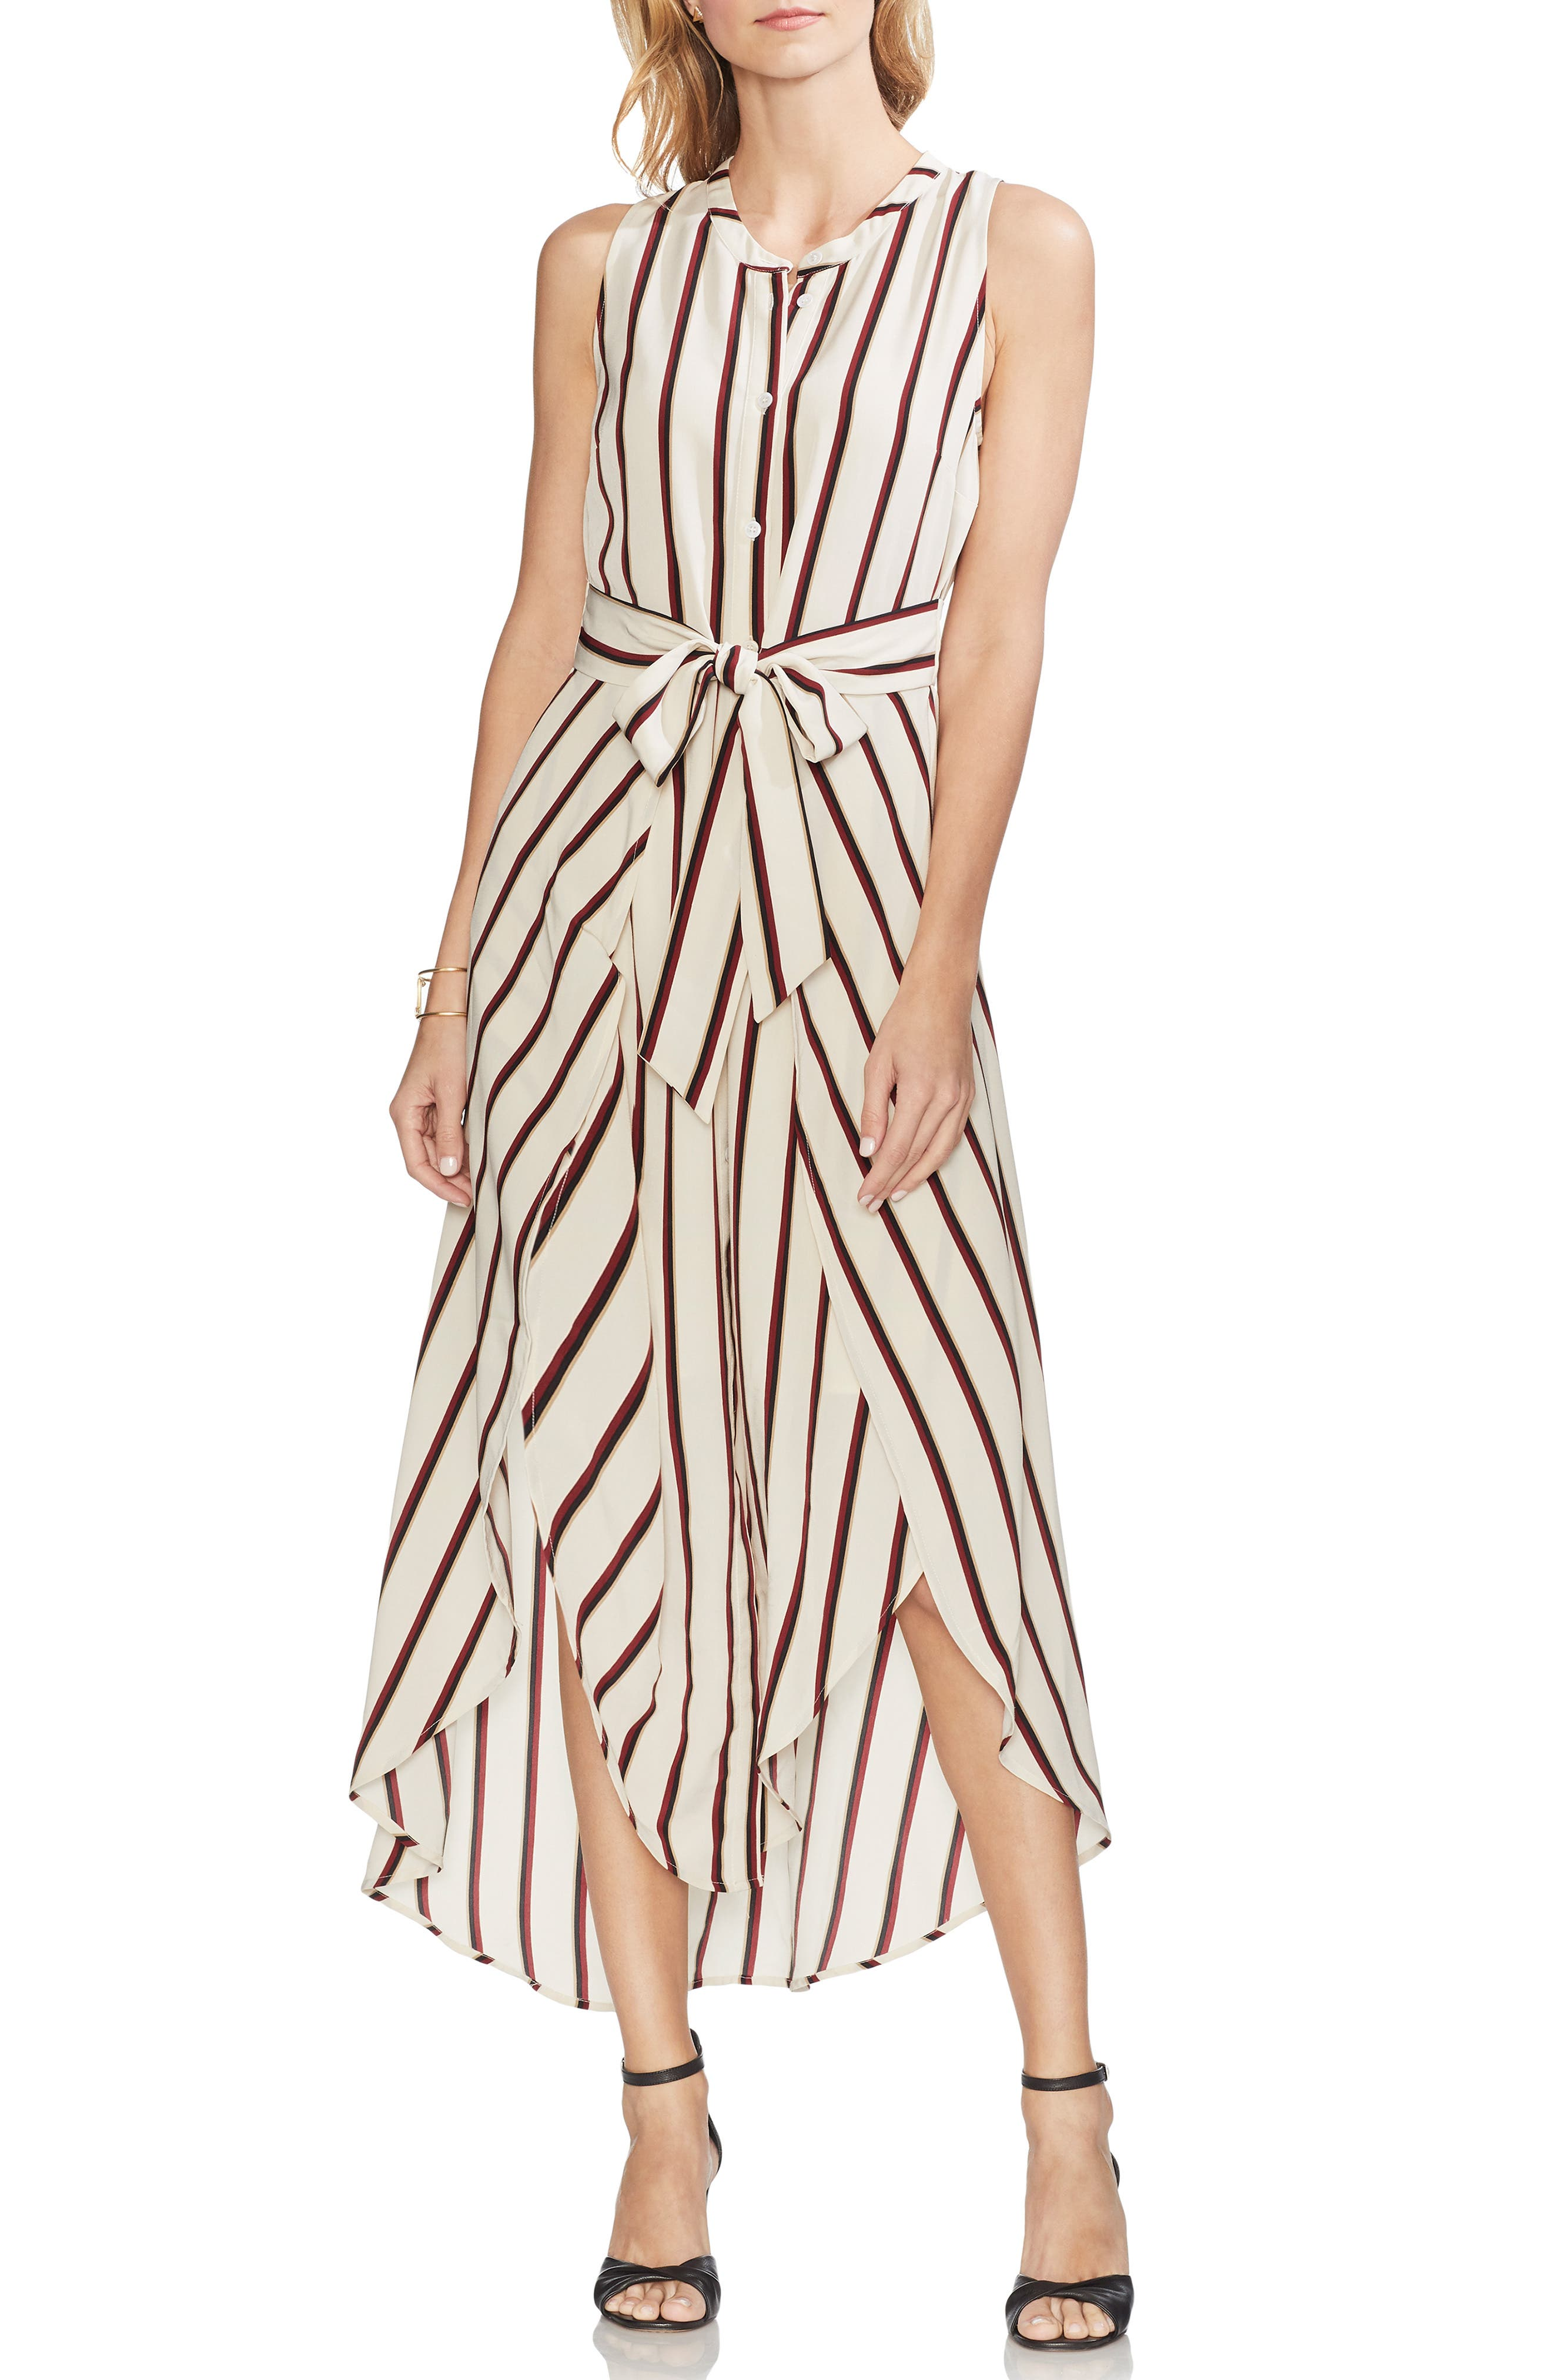 Vince Camuto Caravan Stripe Maxi Dress, Beige